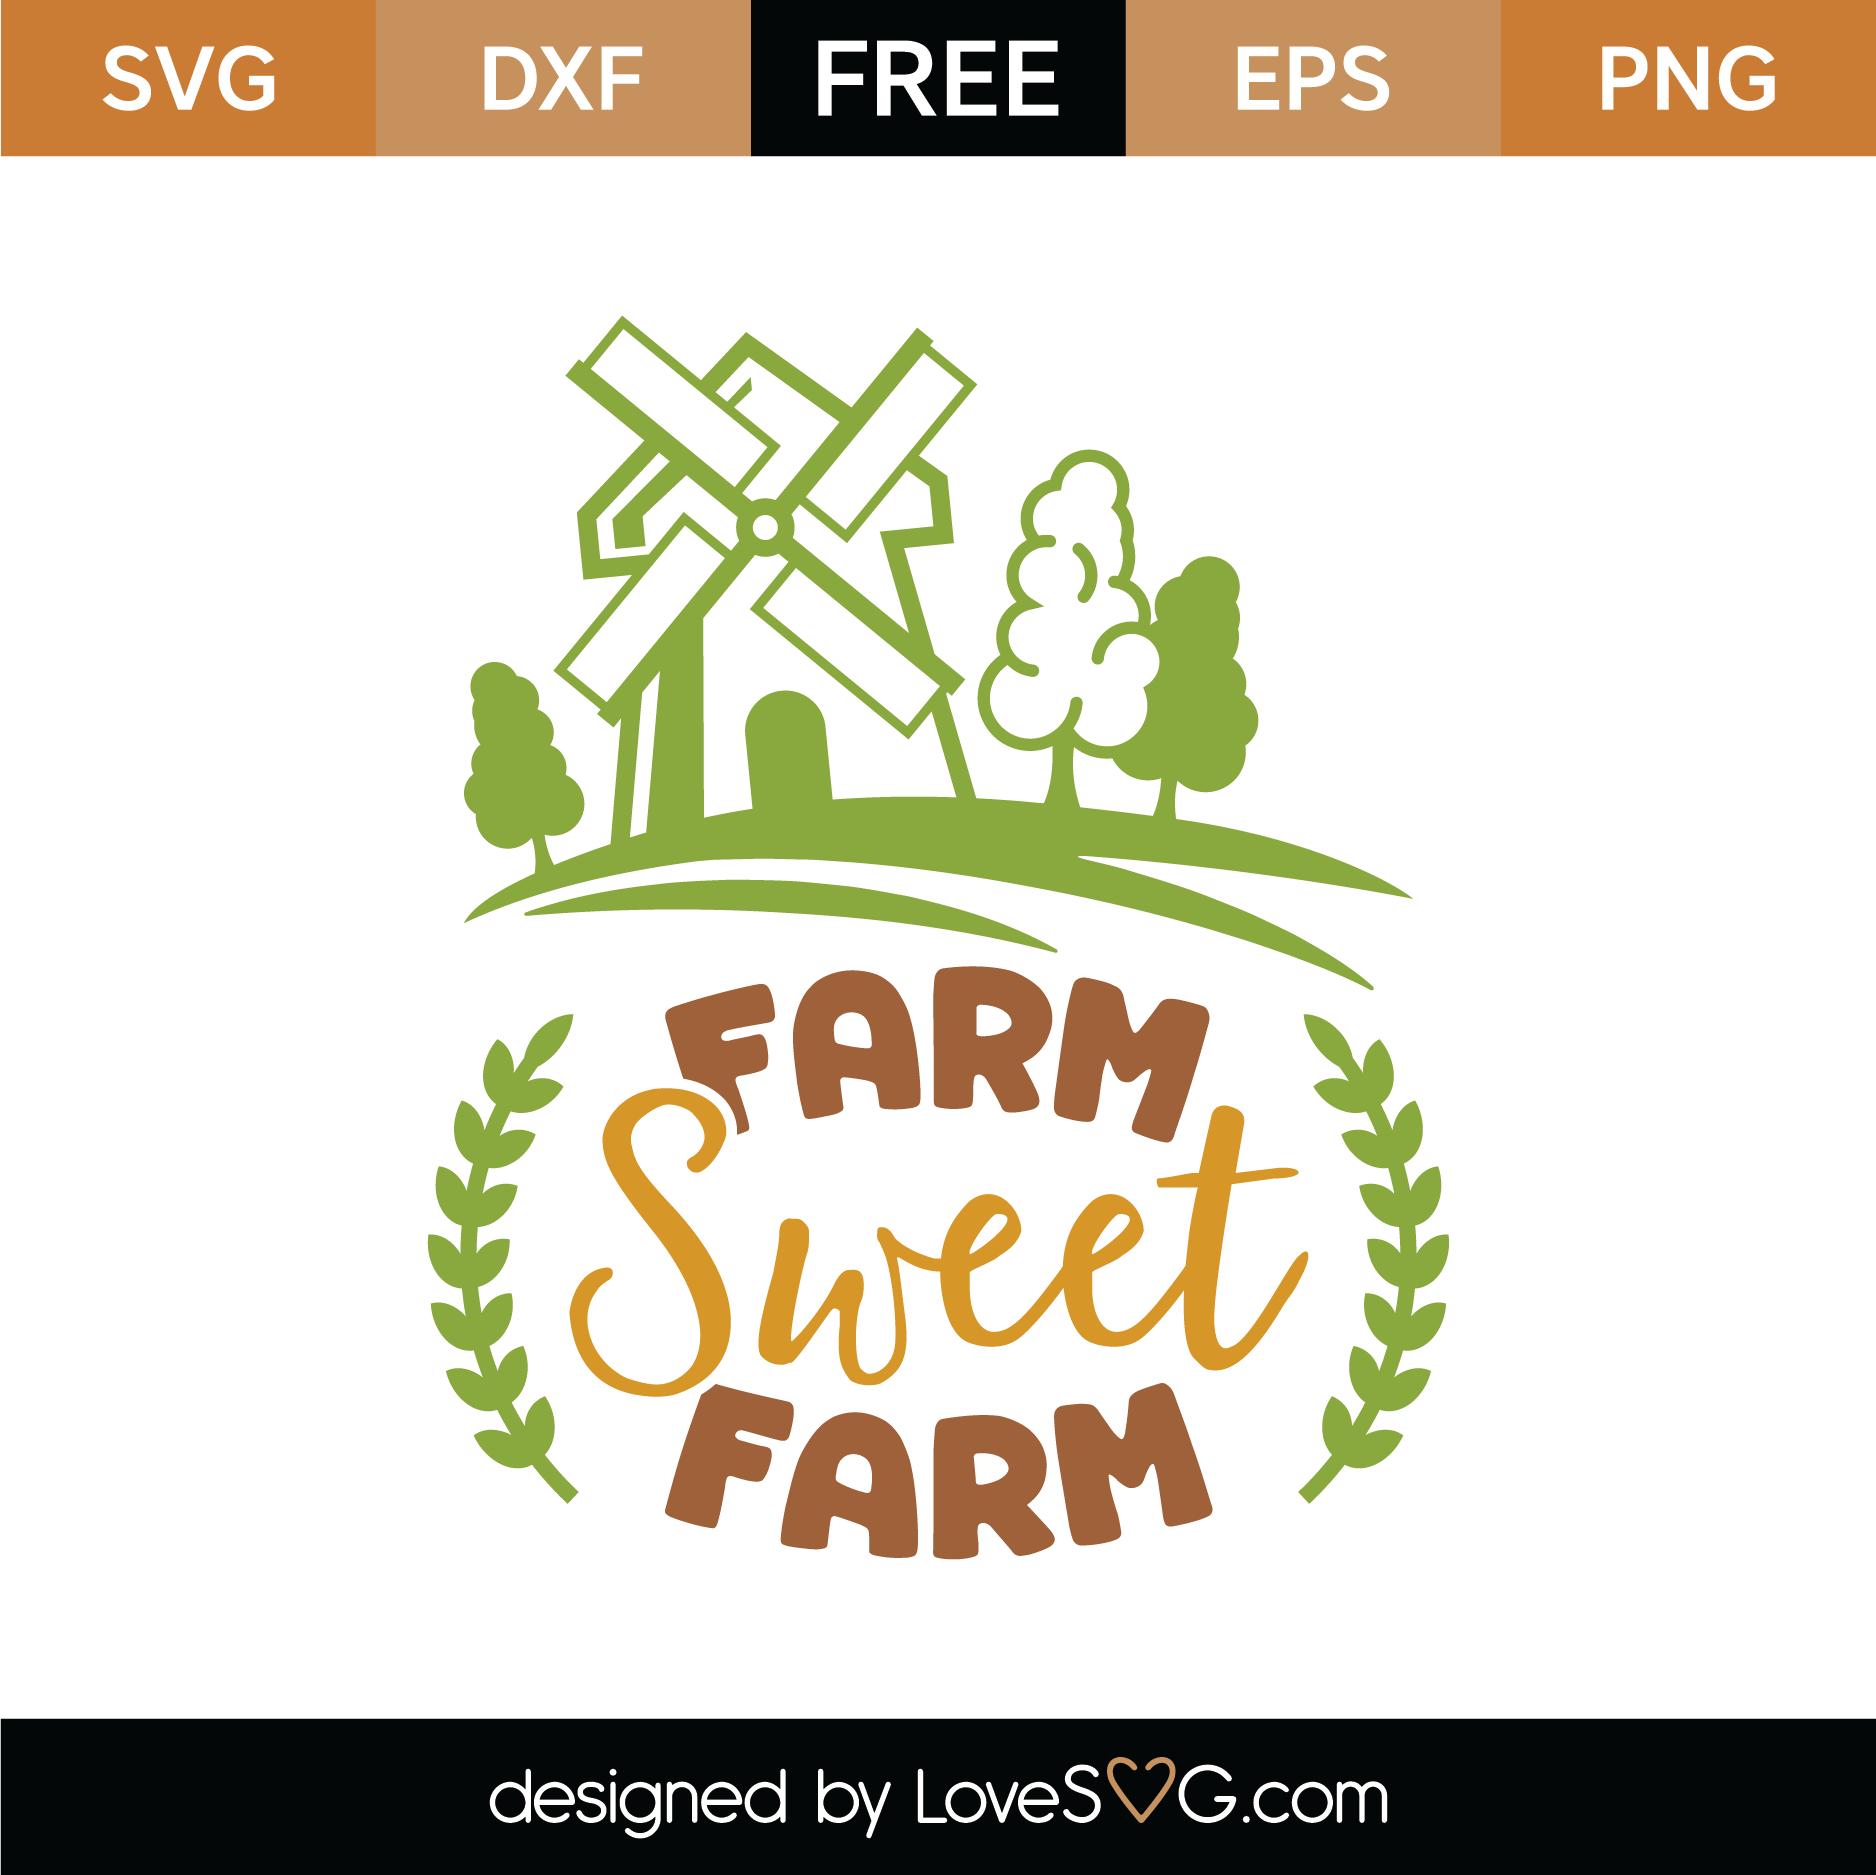 Free Farm Sweet Farm Svg Cut File